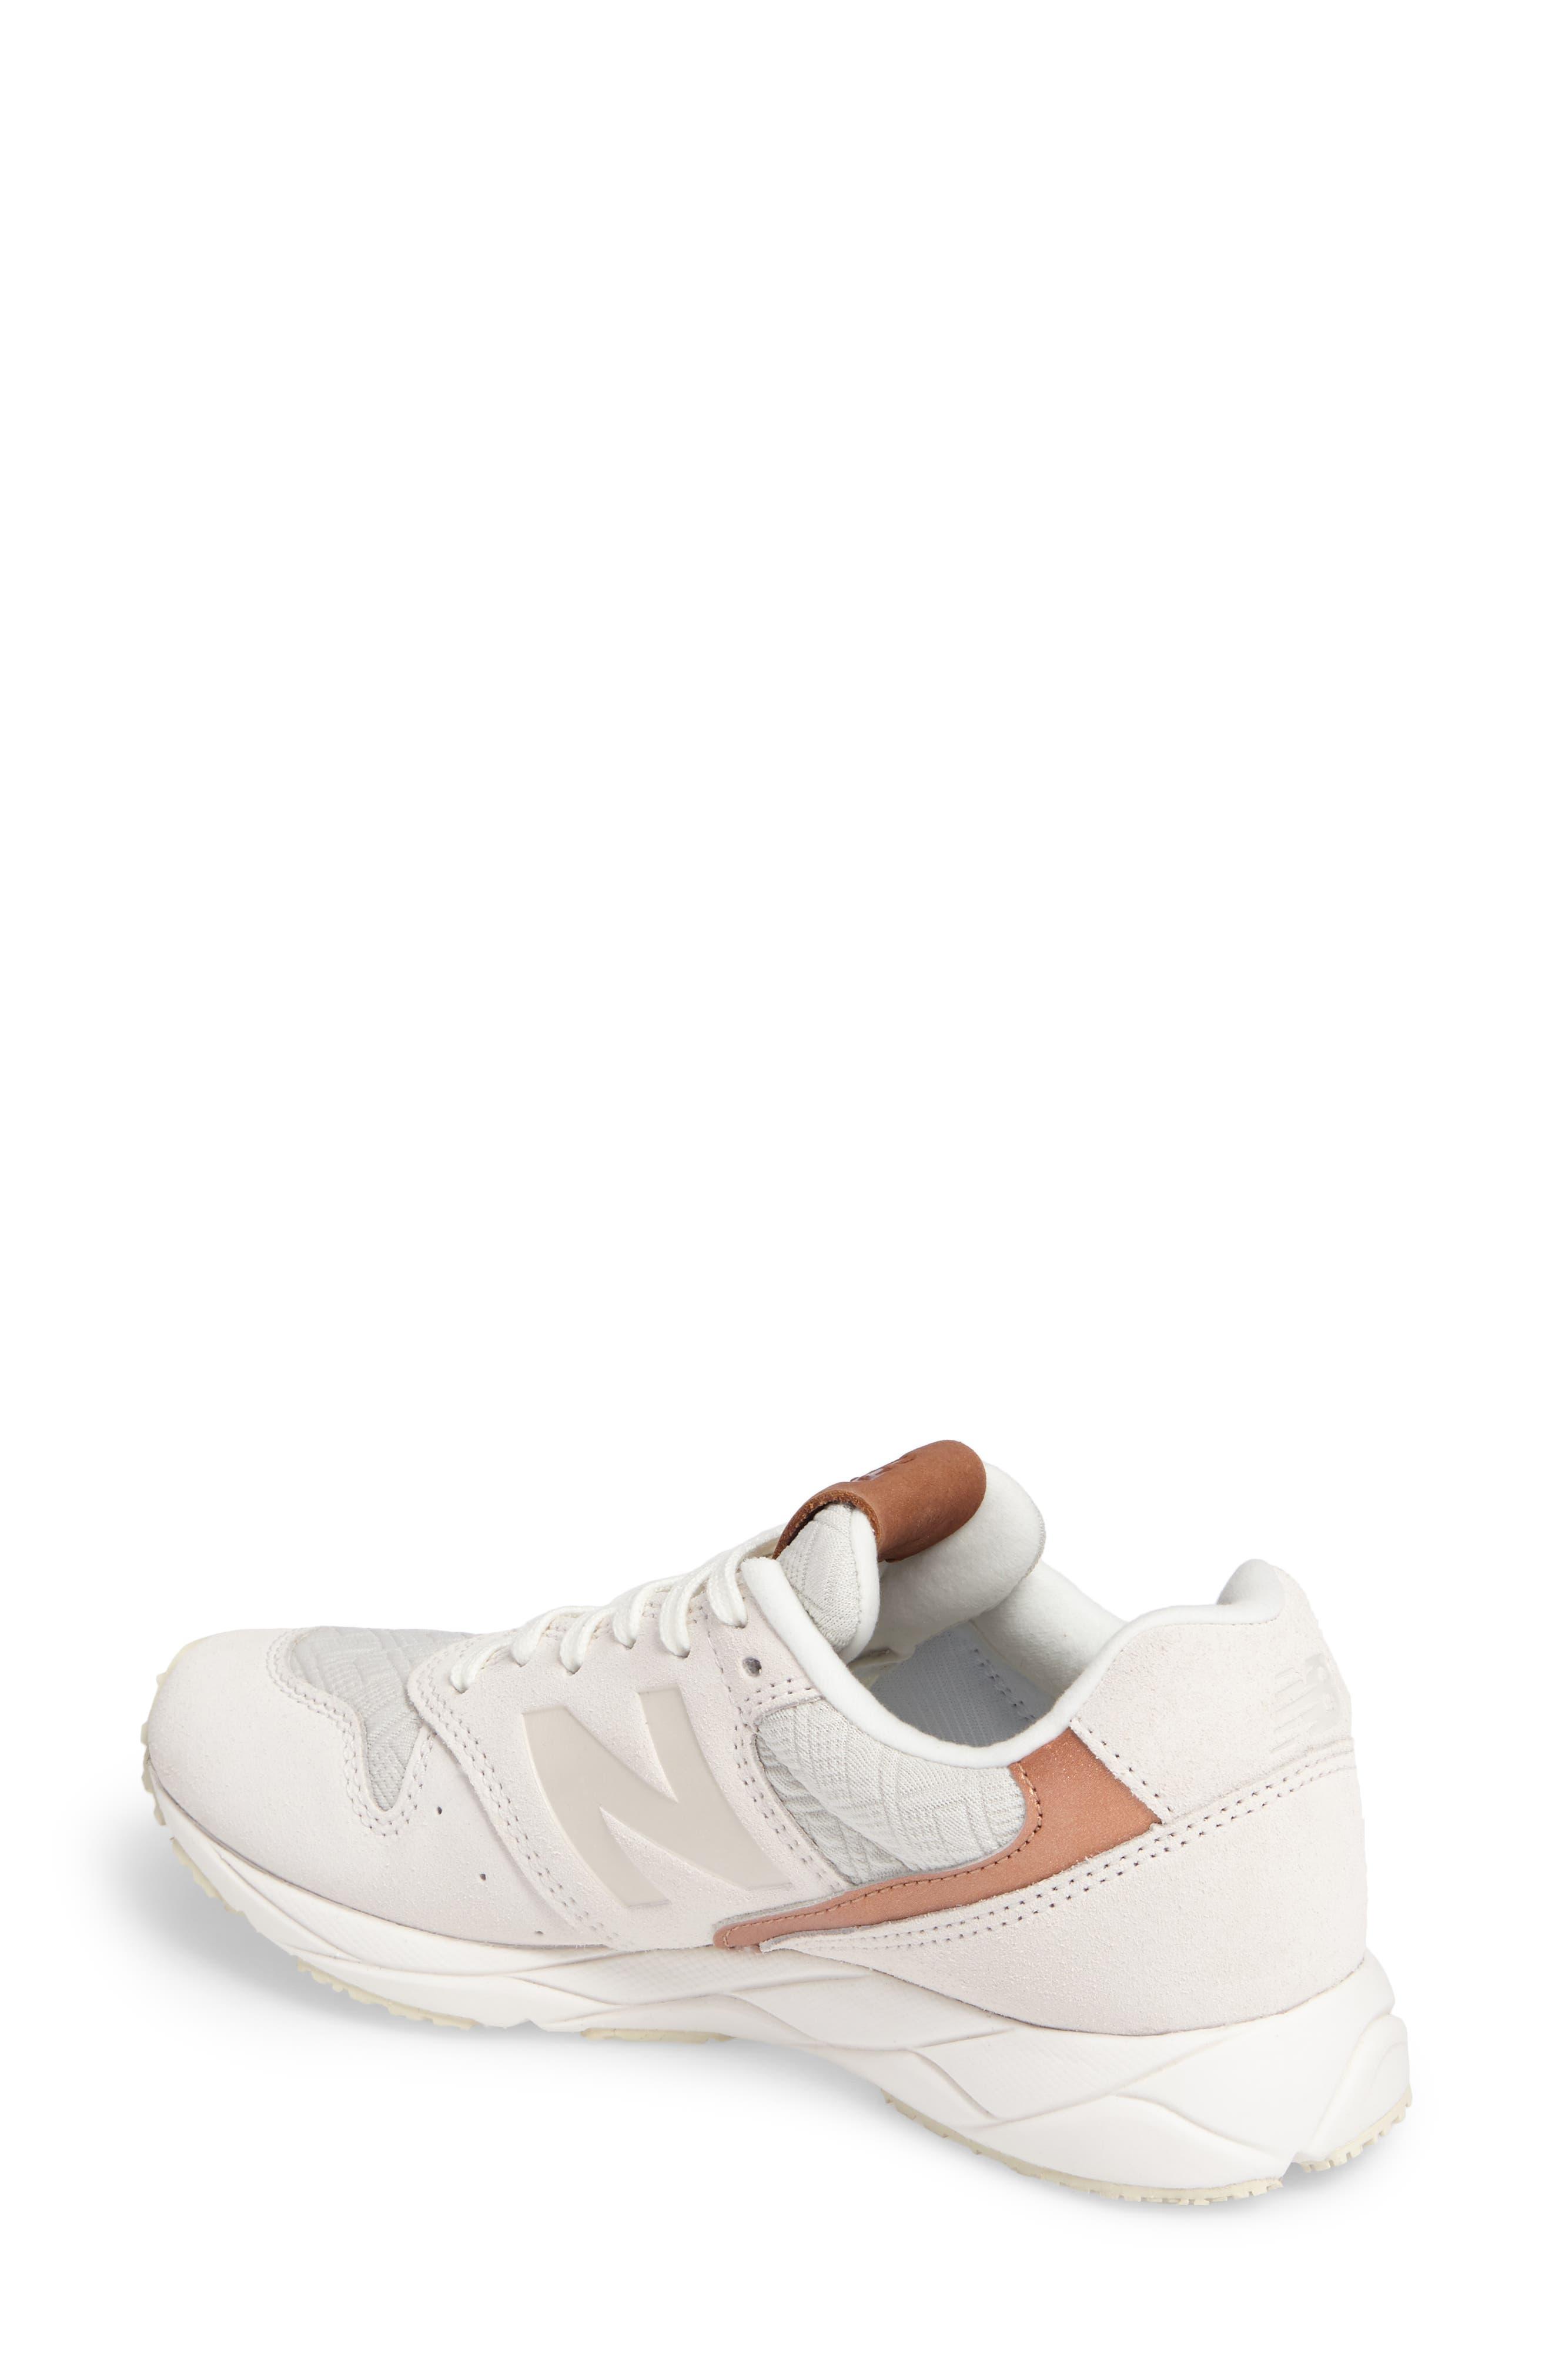 96 Mash-Up Sneaker,                             Alternate thumbnail 2, color,                             250